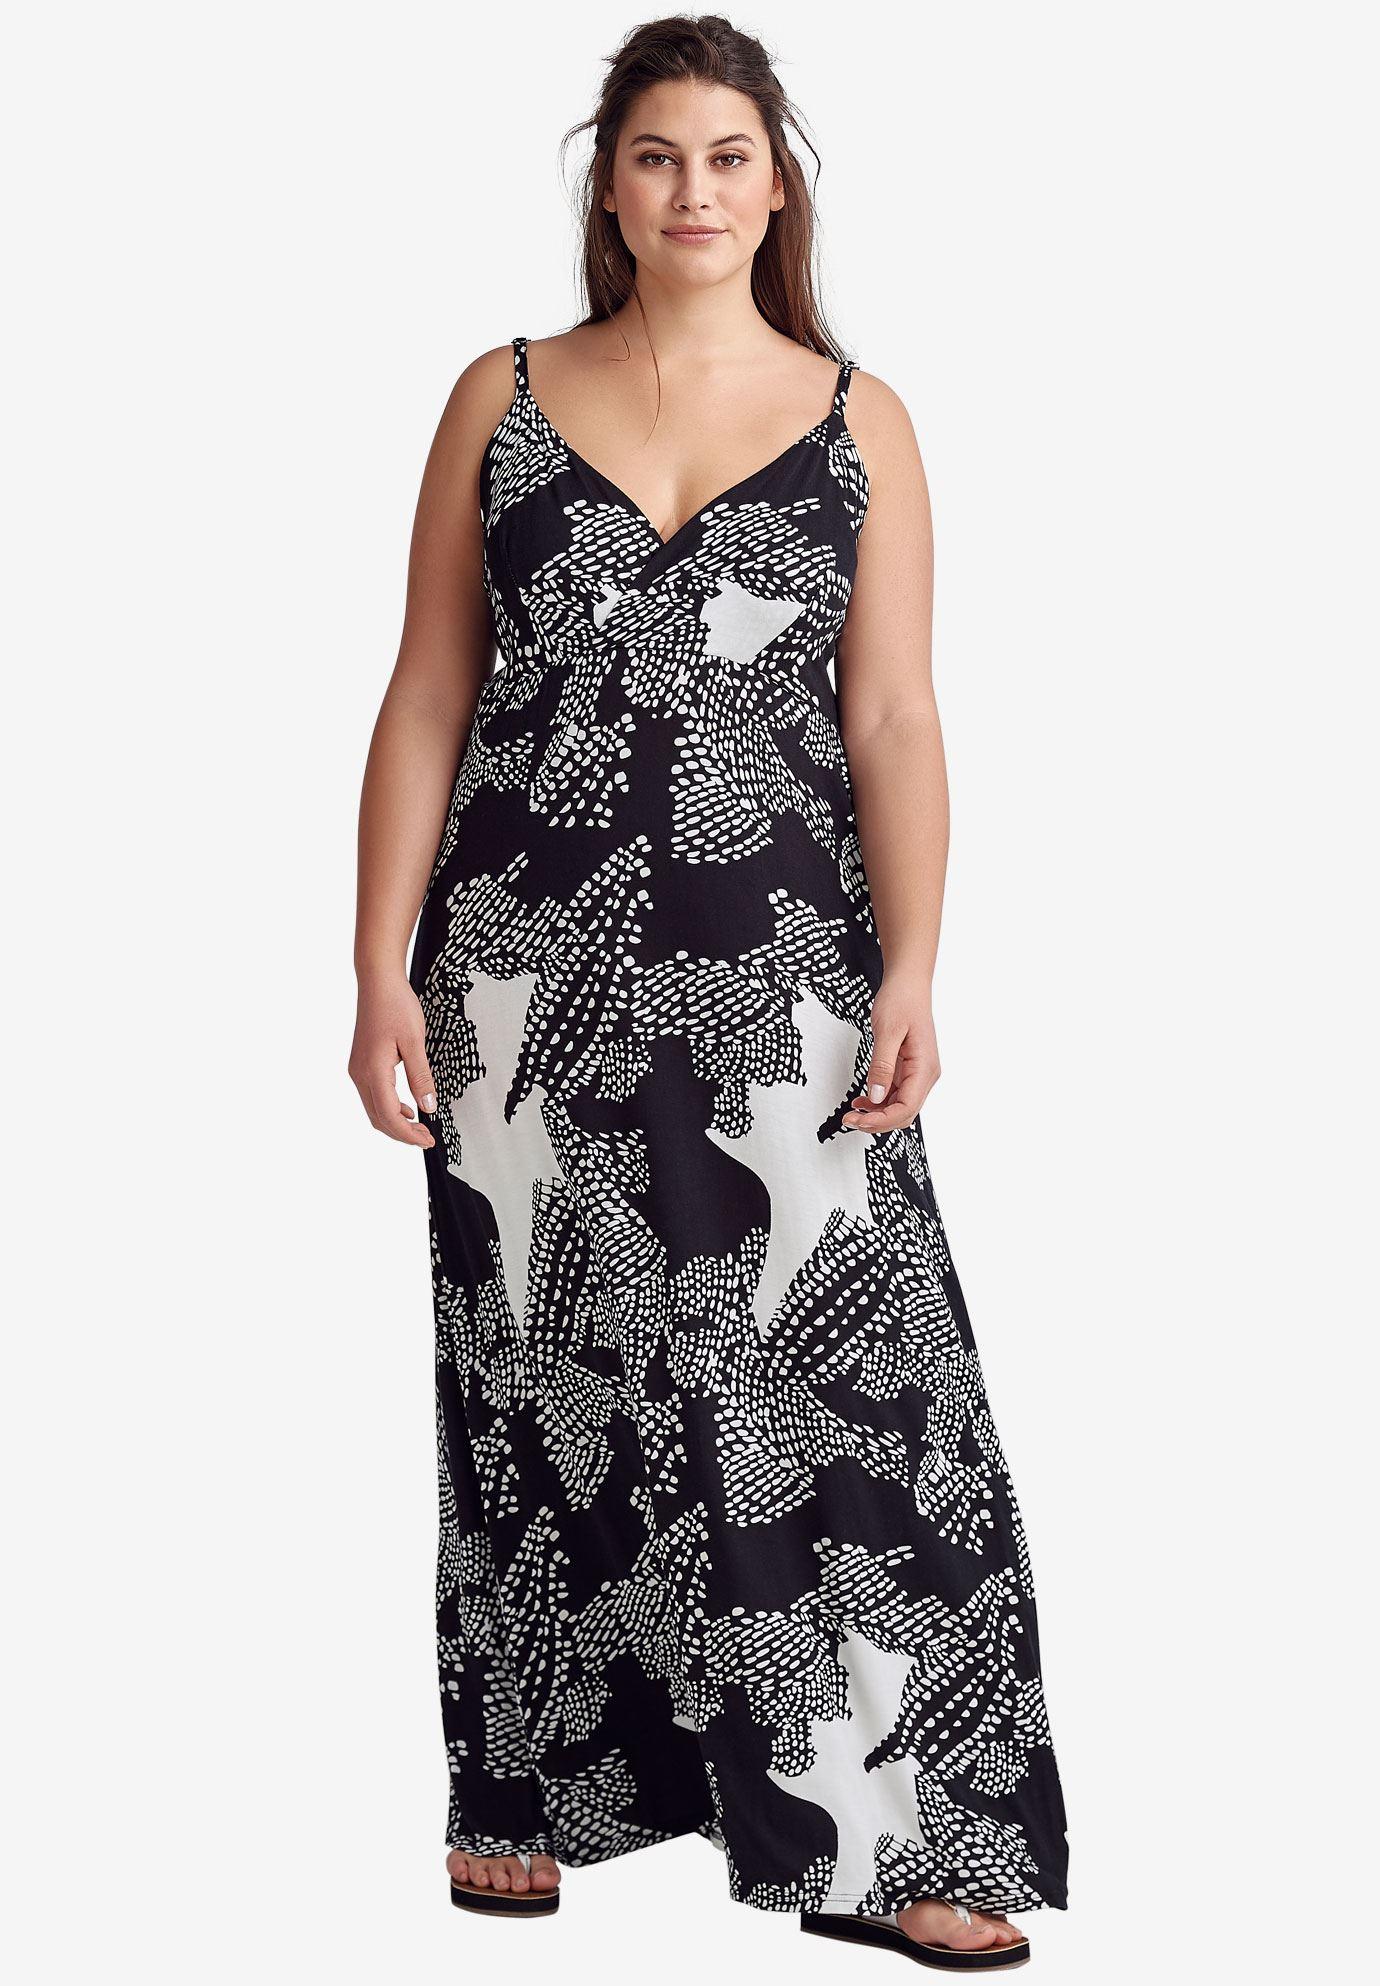 Ellos - Plus Size Knit Surplice Maxi Dress - Walmart.com